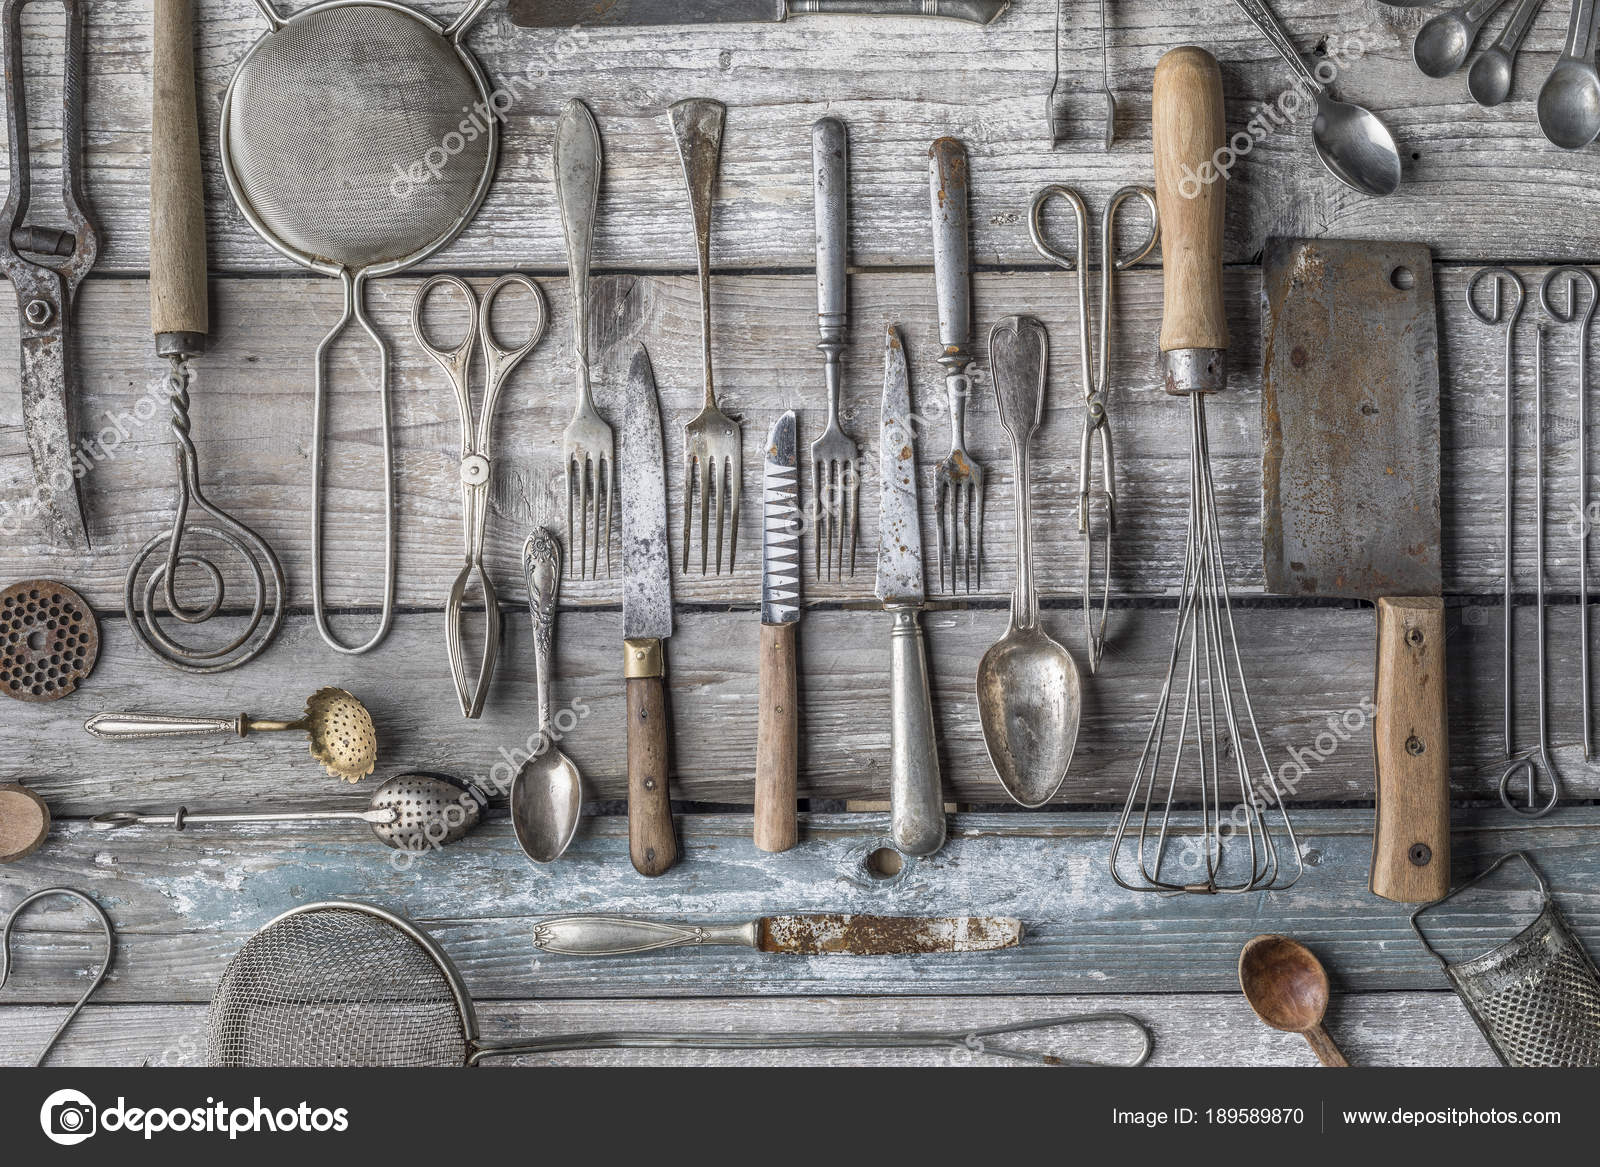 Vintage Kitchen Utensils Background Fork Kifes Spoons Stock